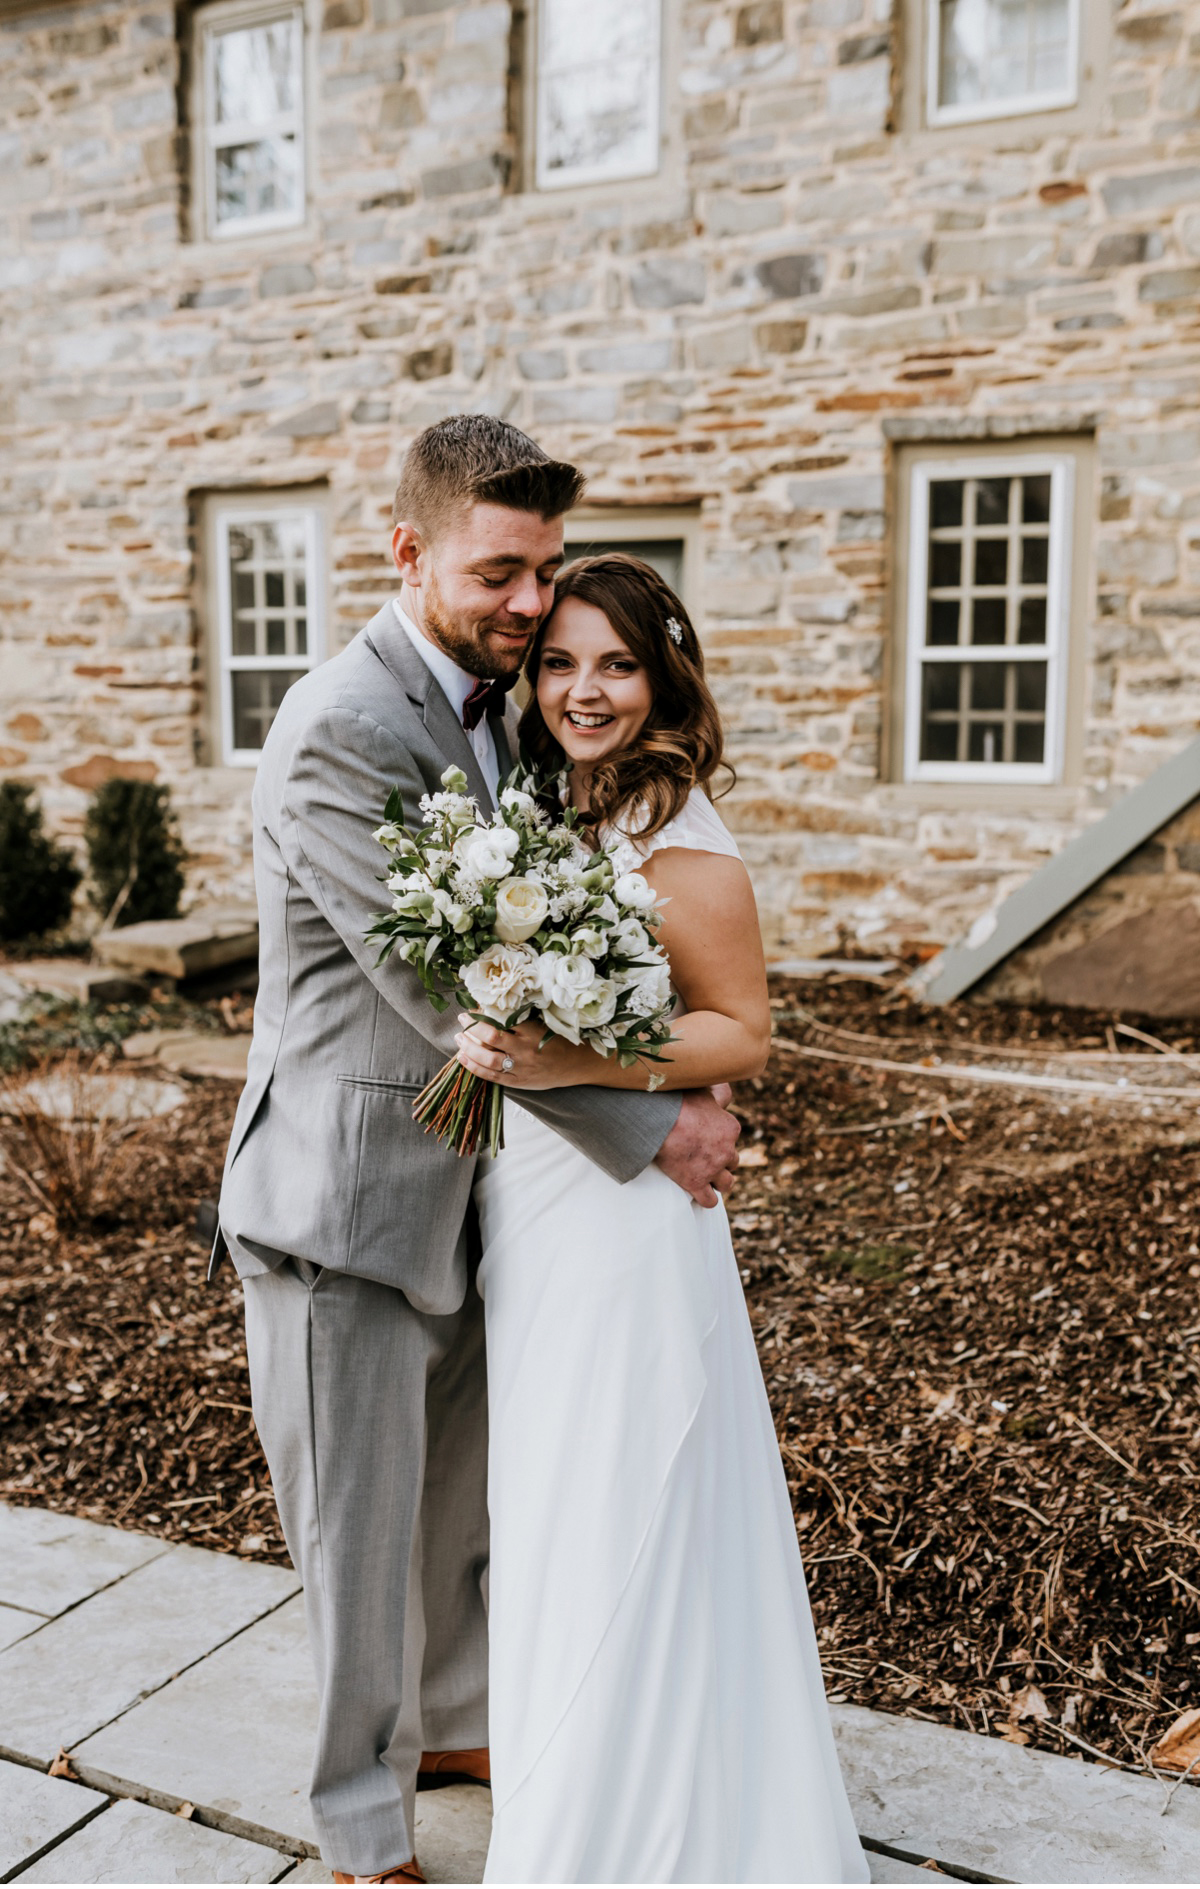 21 Winter Elopement Adventurous Elopement Photographer New Jersey Wedding Photographer Intimate Wedding